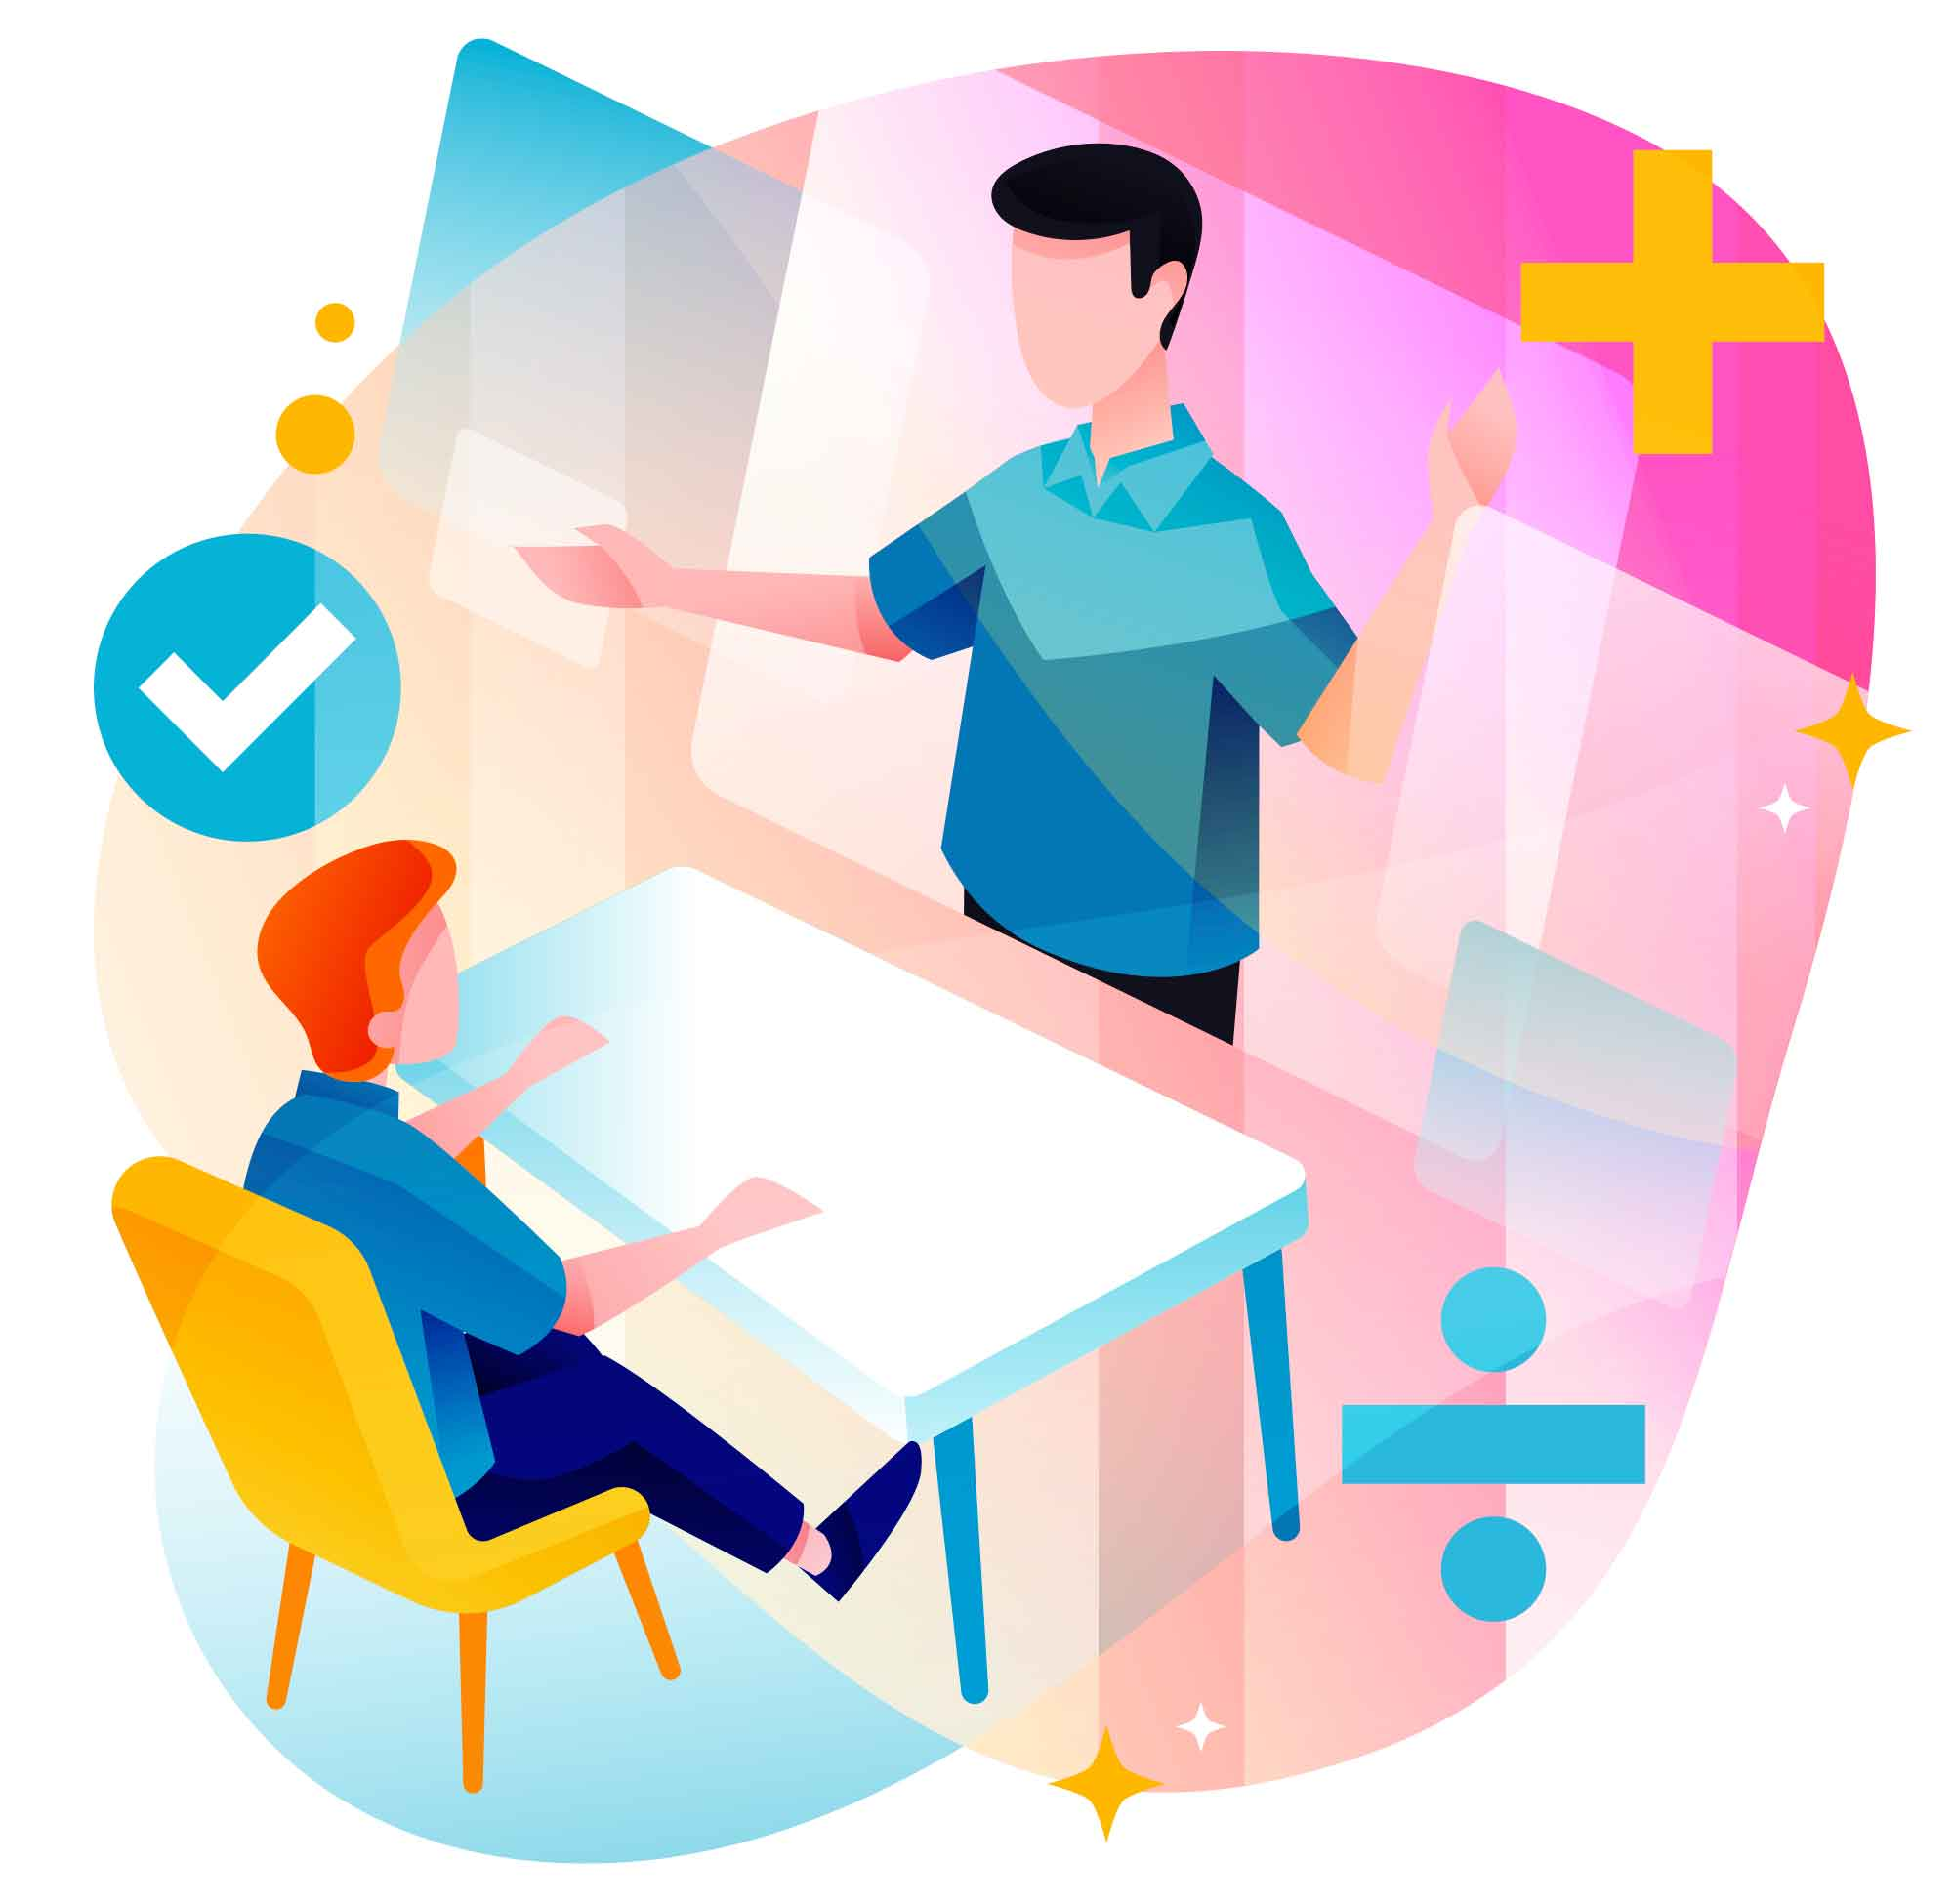 Online Math Course Illustration